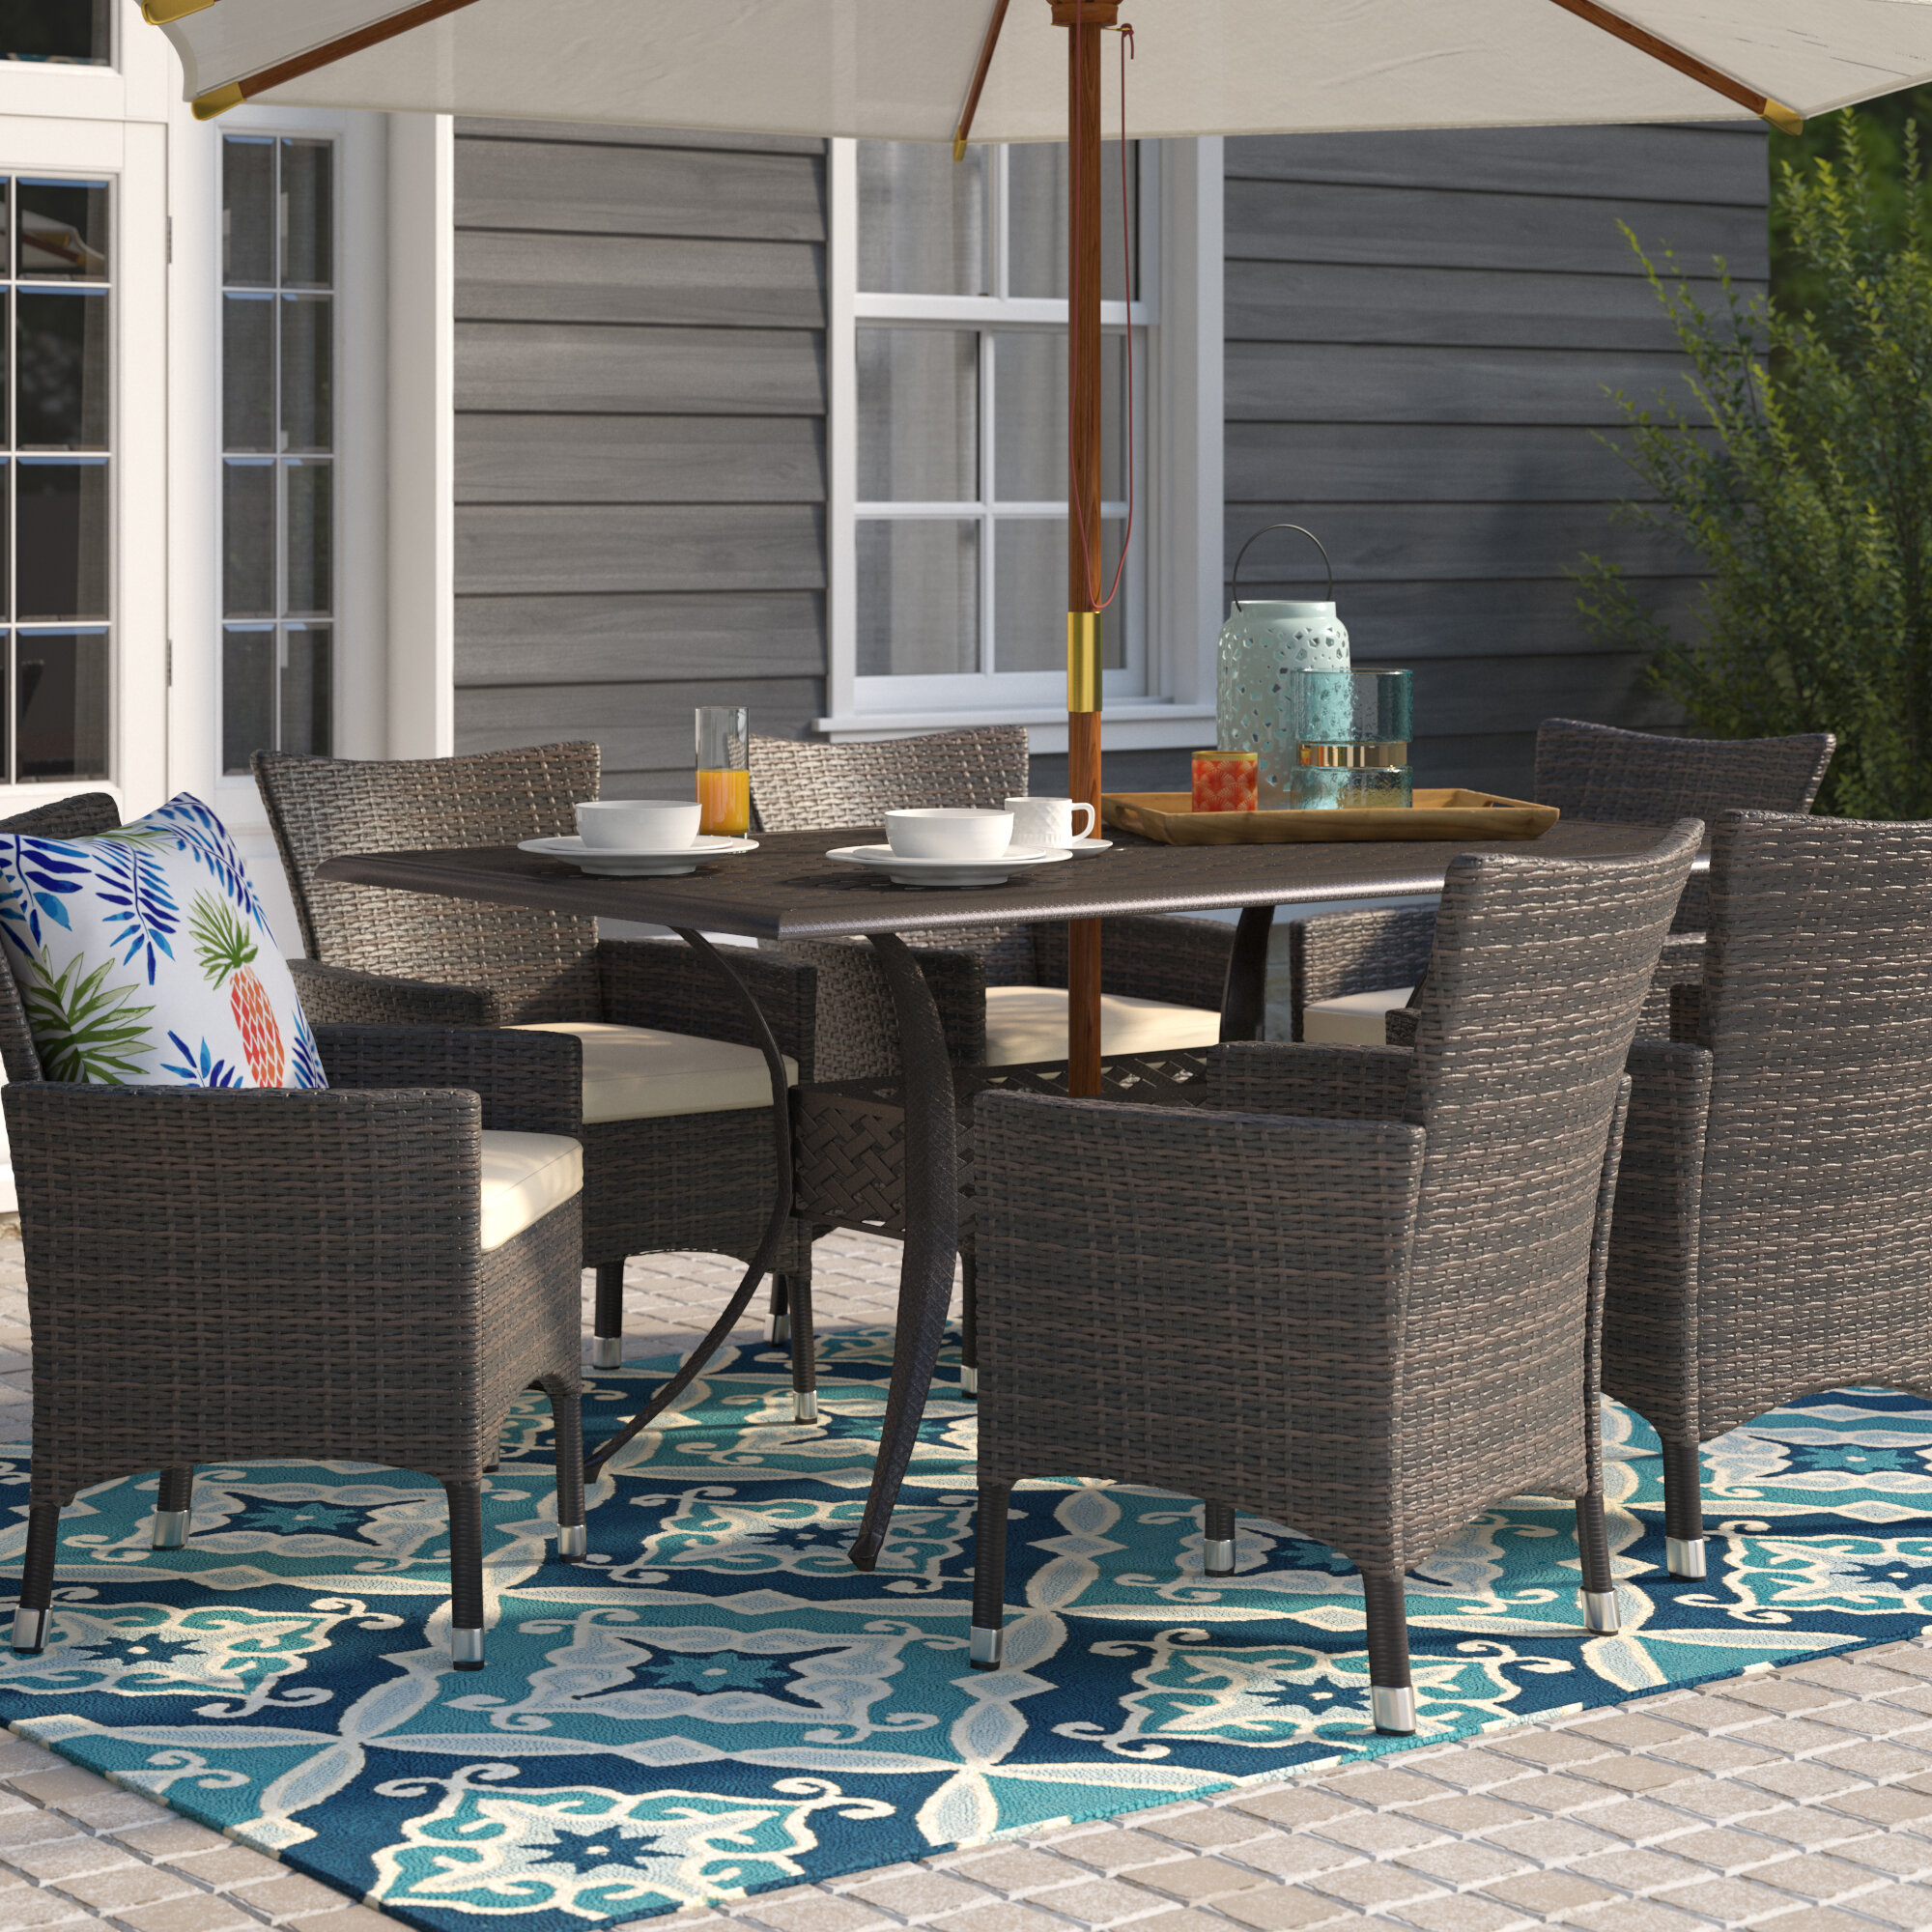 Beachcrest Home Tellara Outdoor 7 Piece Dining Set With Cushions U0026 Reviews  | Wayfair